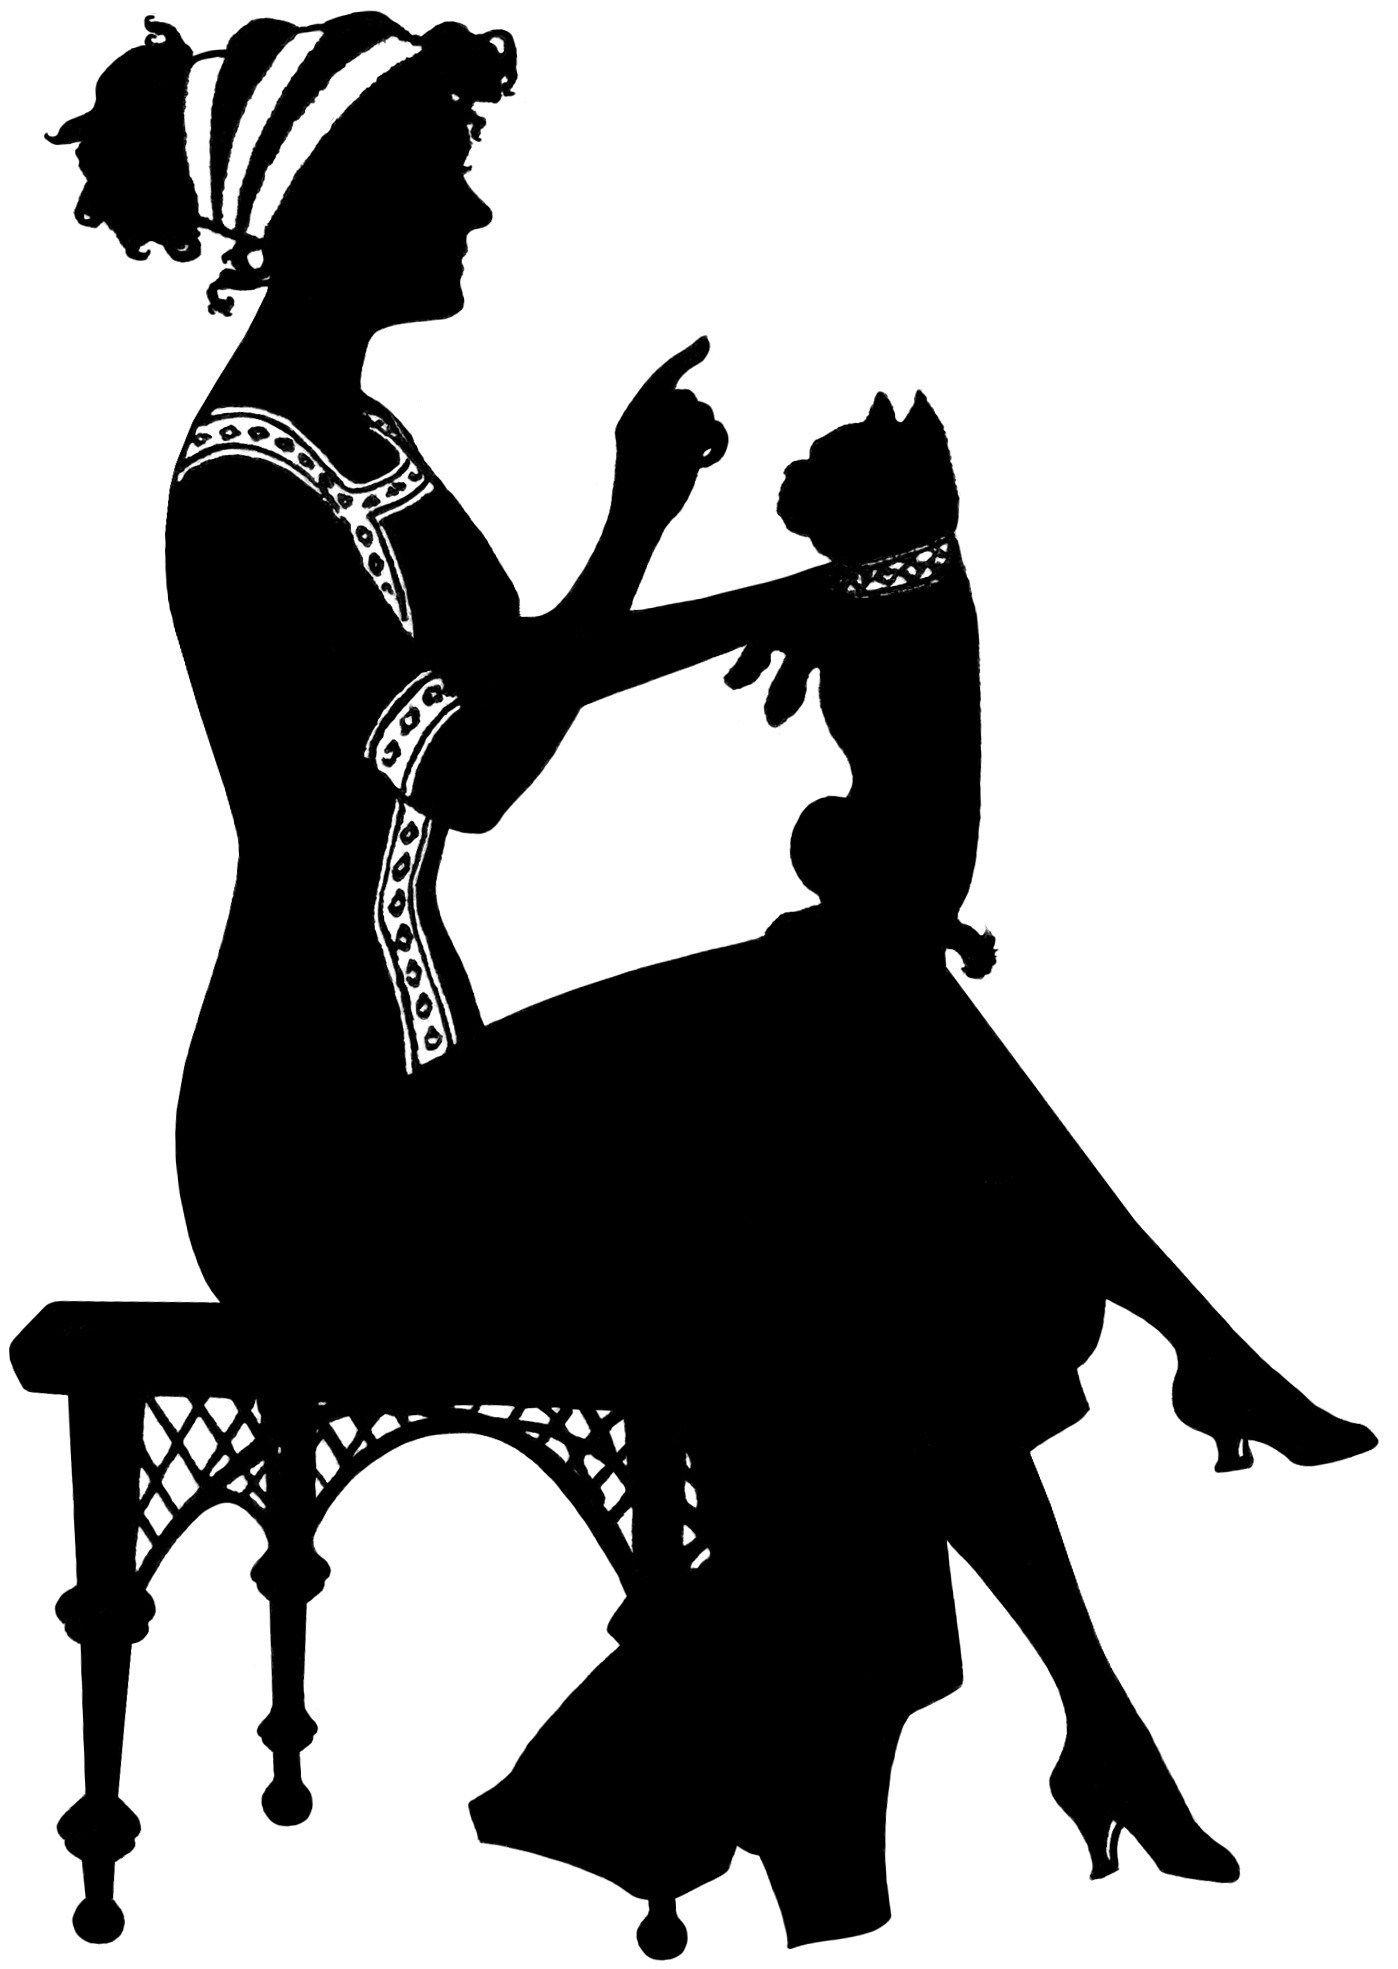 vintage silhouette lady, woman holding dog illustration.